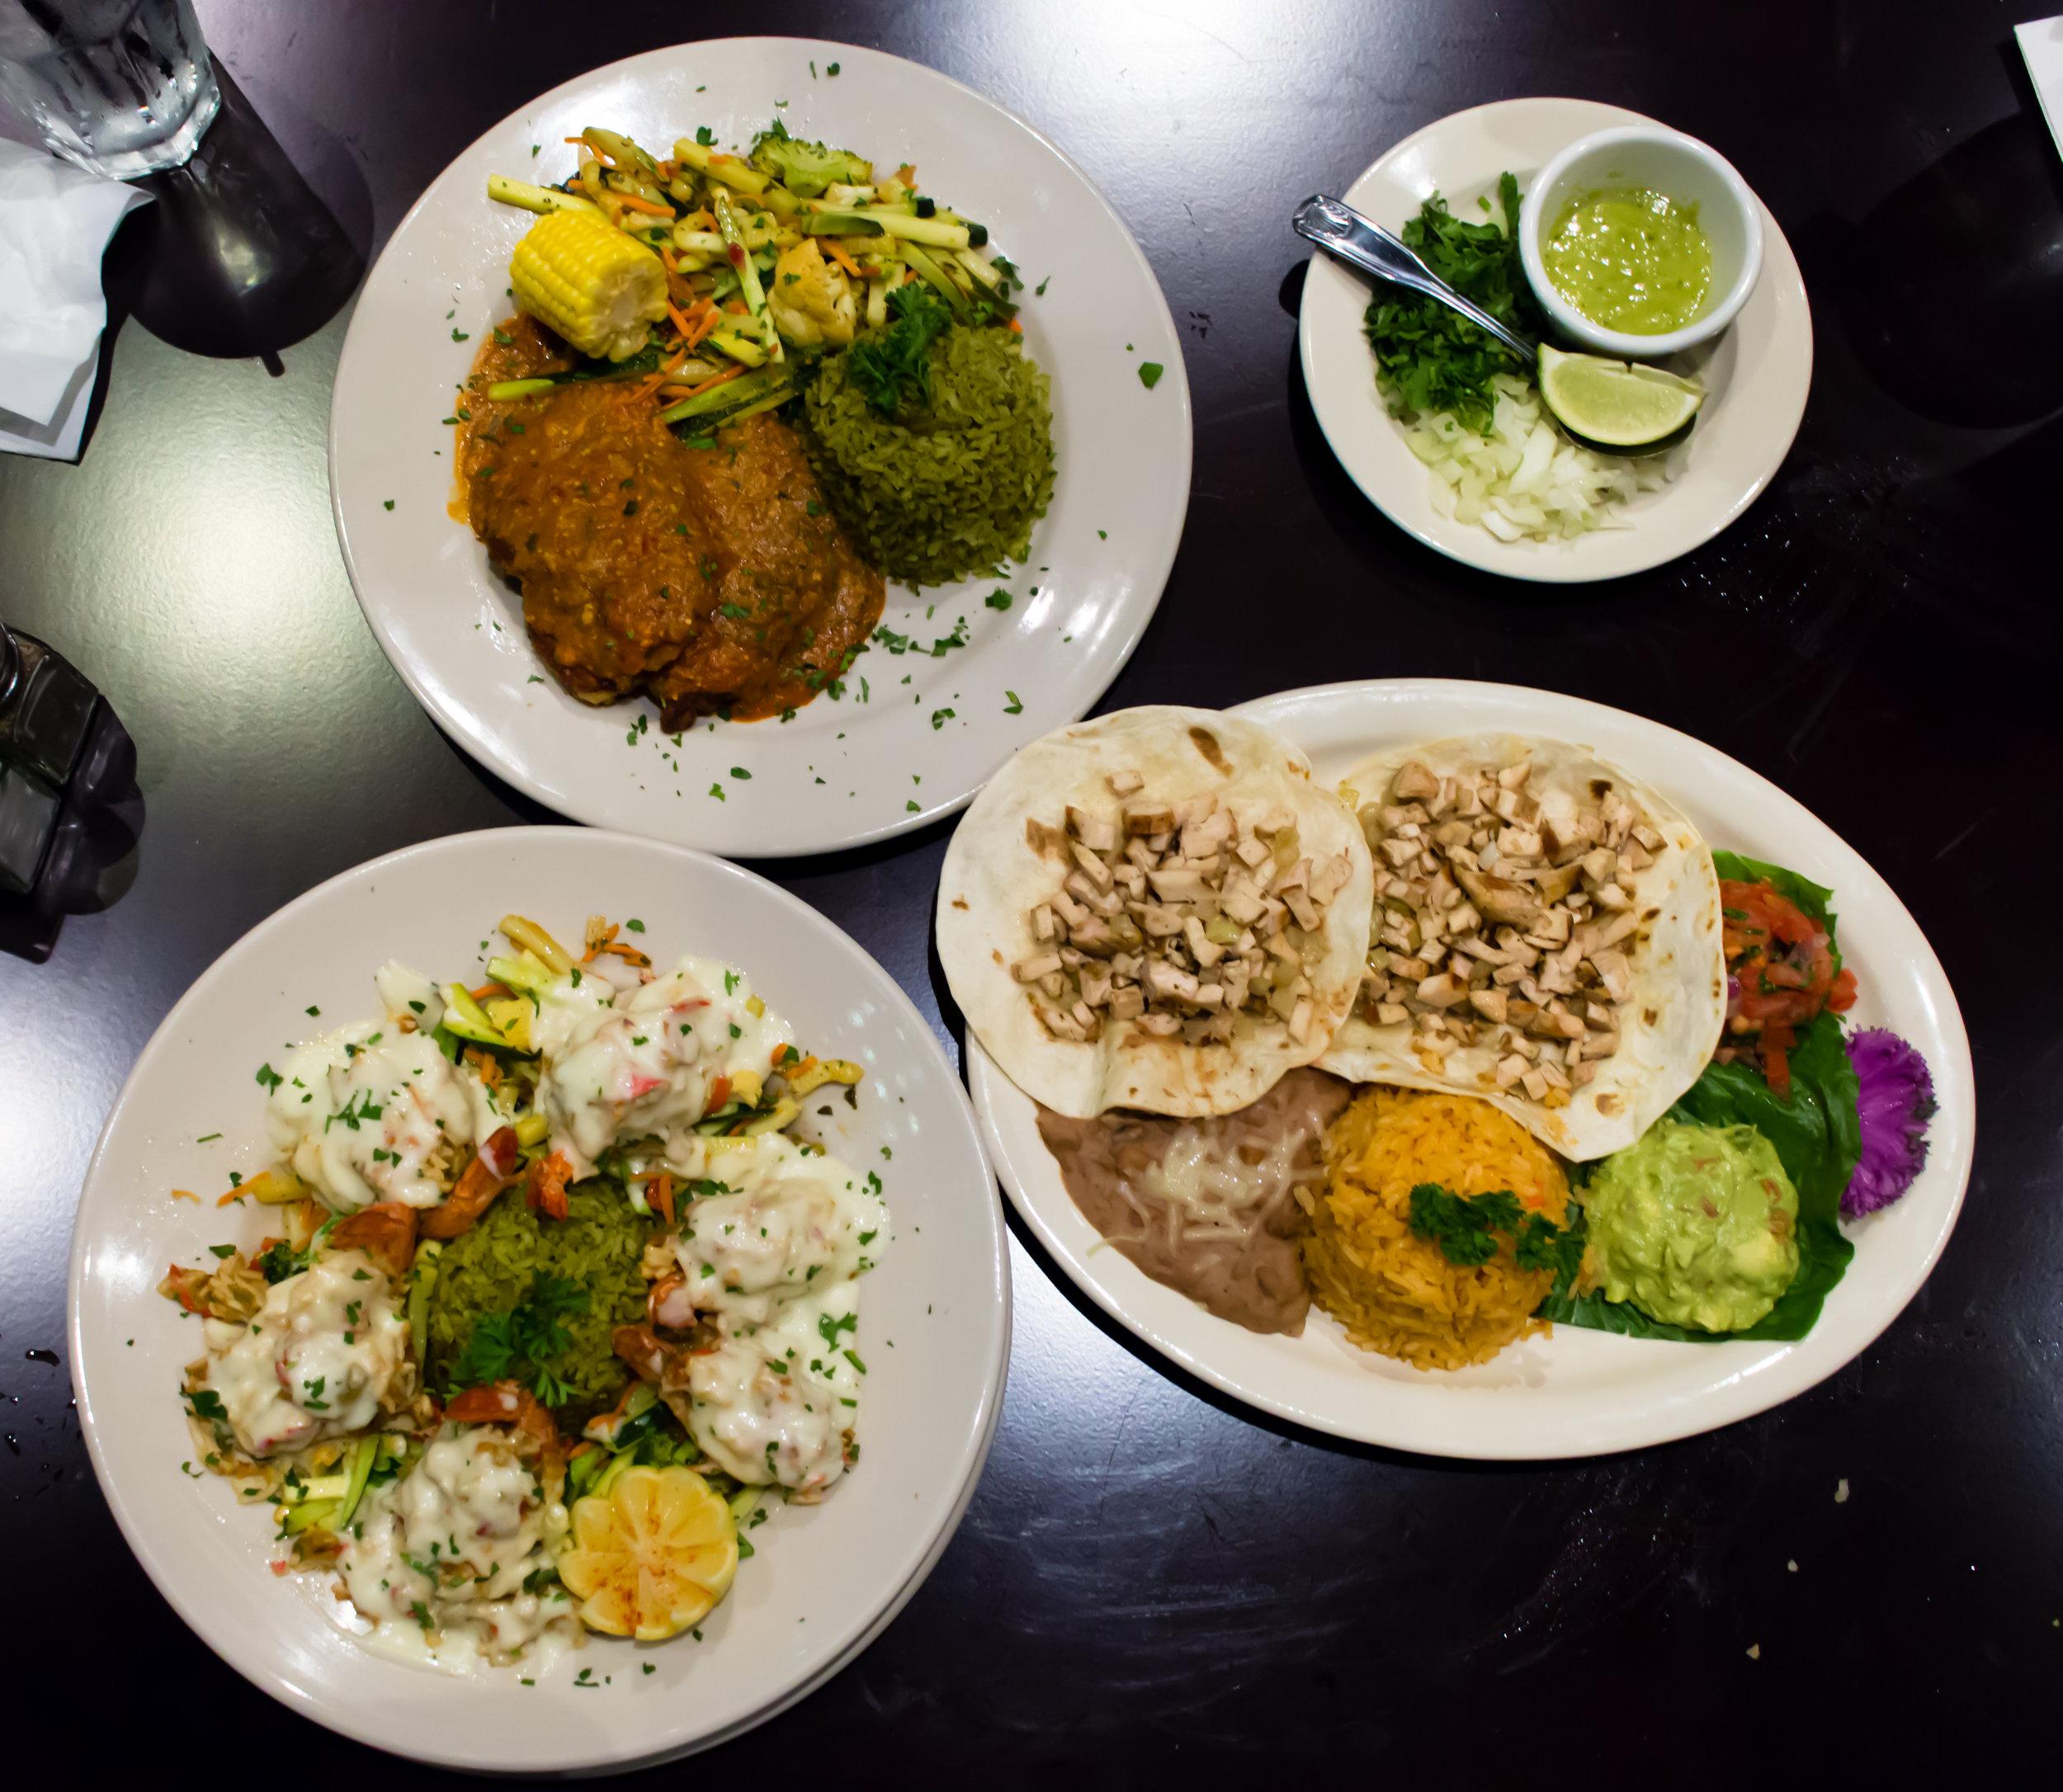 entrees-fernandos-mexican-cuisine-city-line-dfw